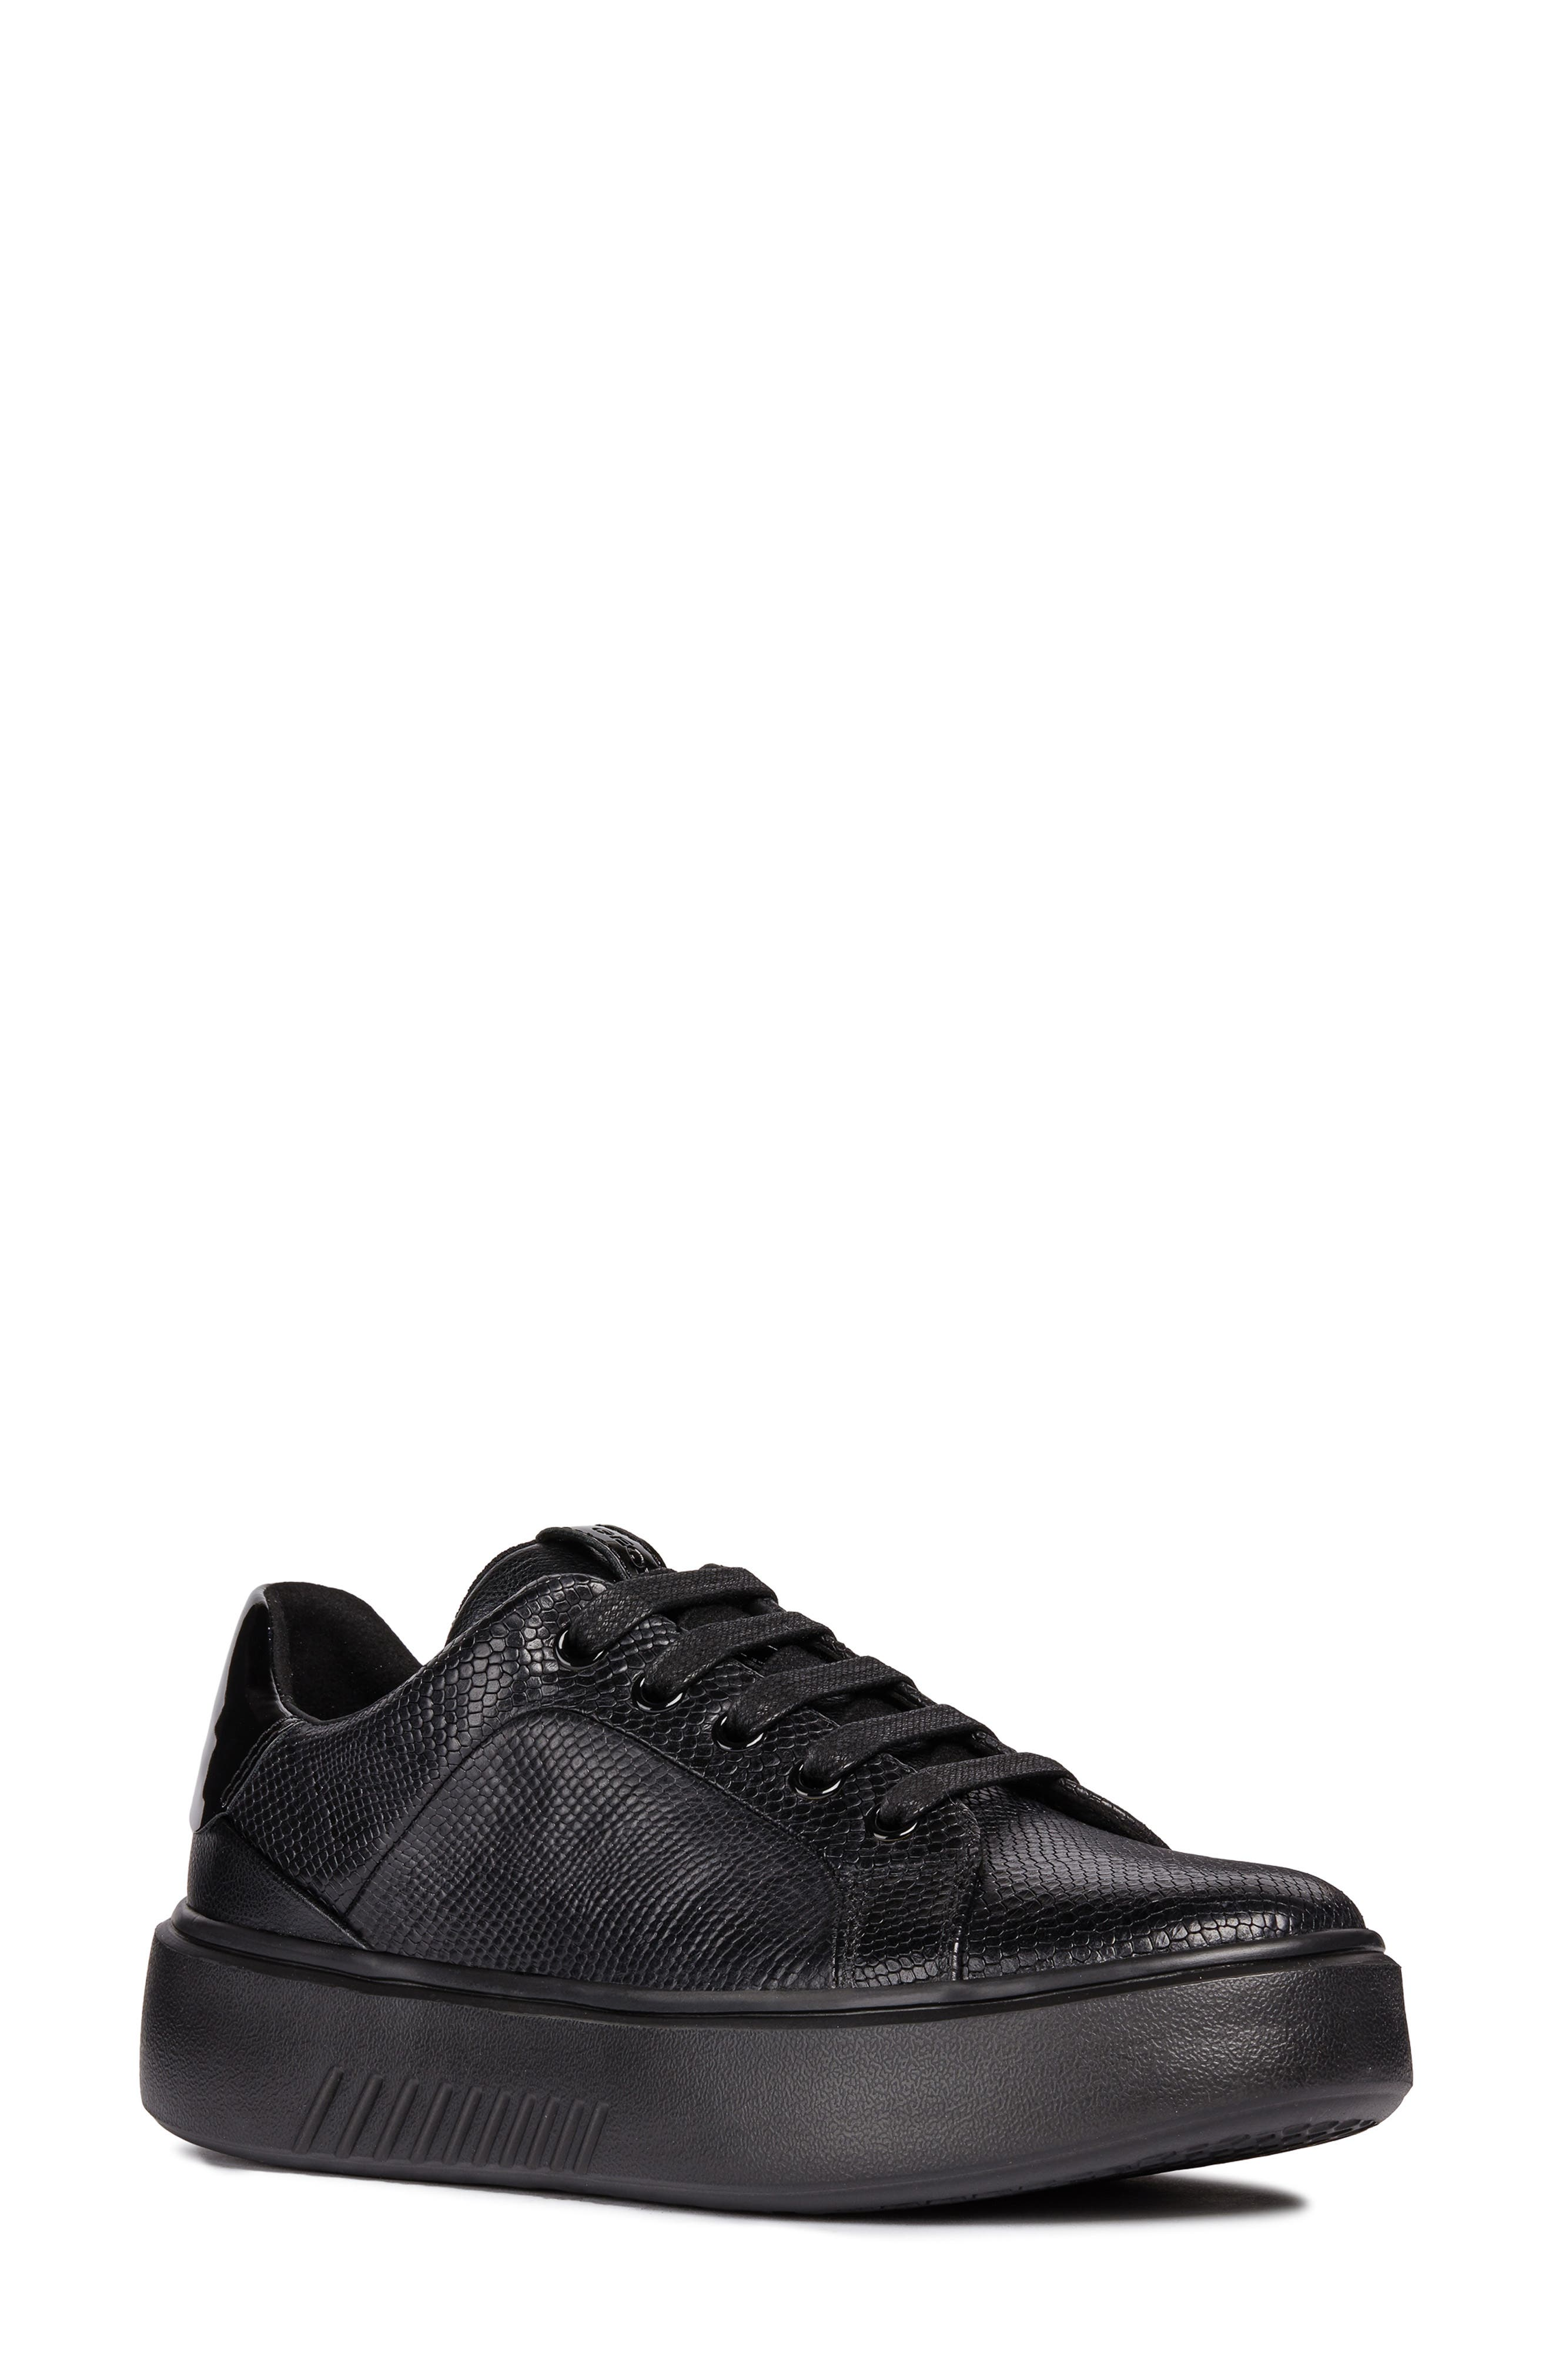 Nhenbus Sneaker,                         Main,                         color, BLACK LEATHER